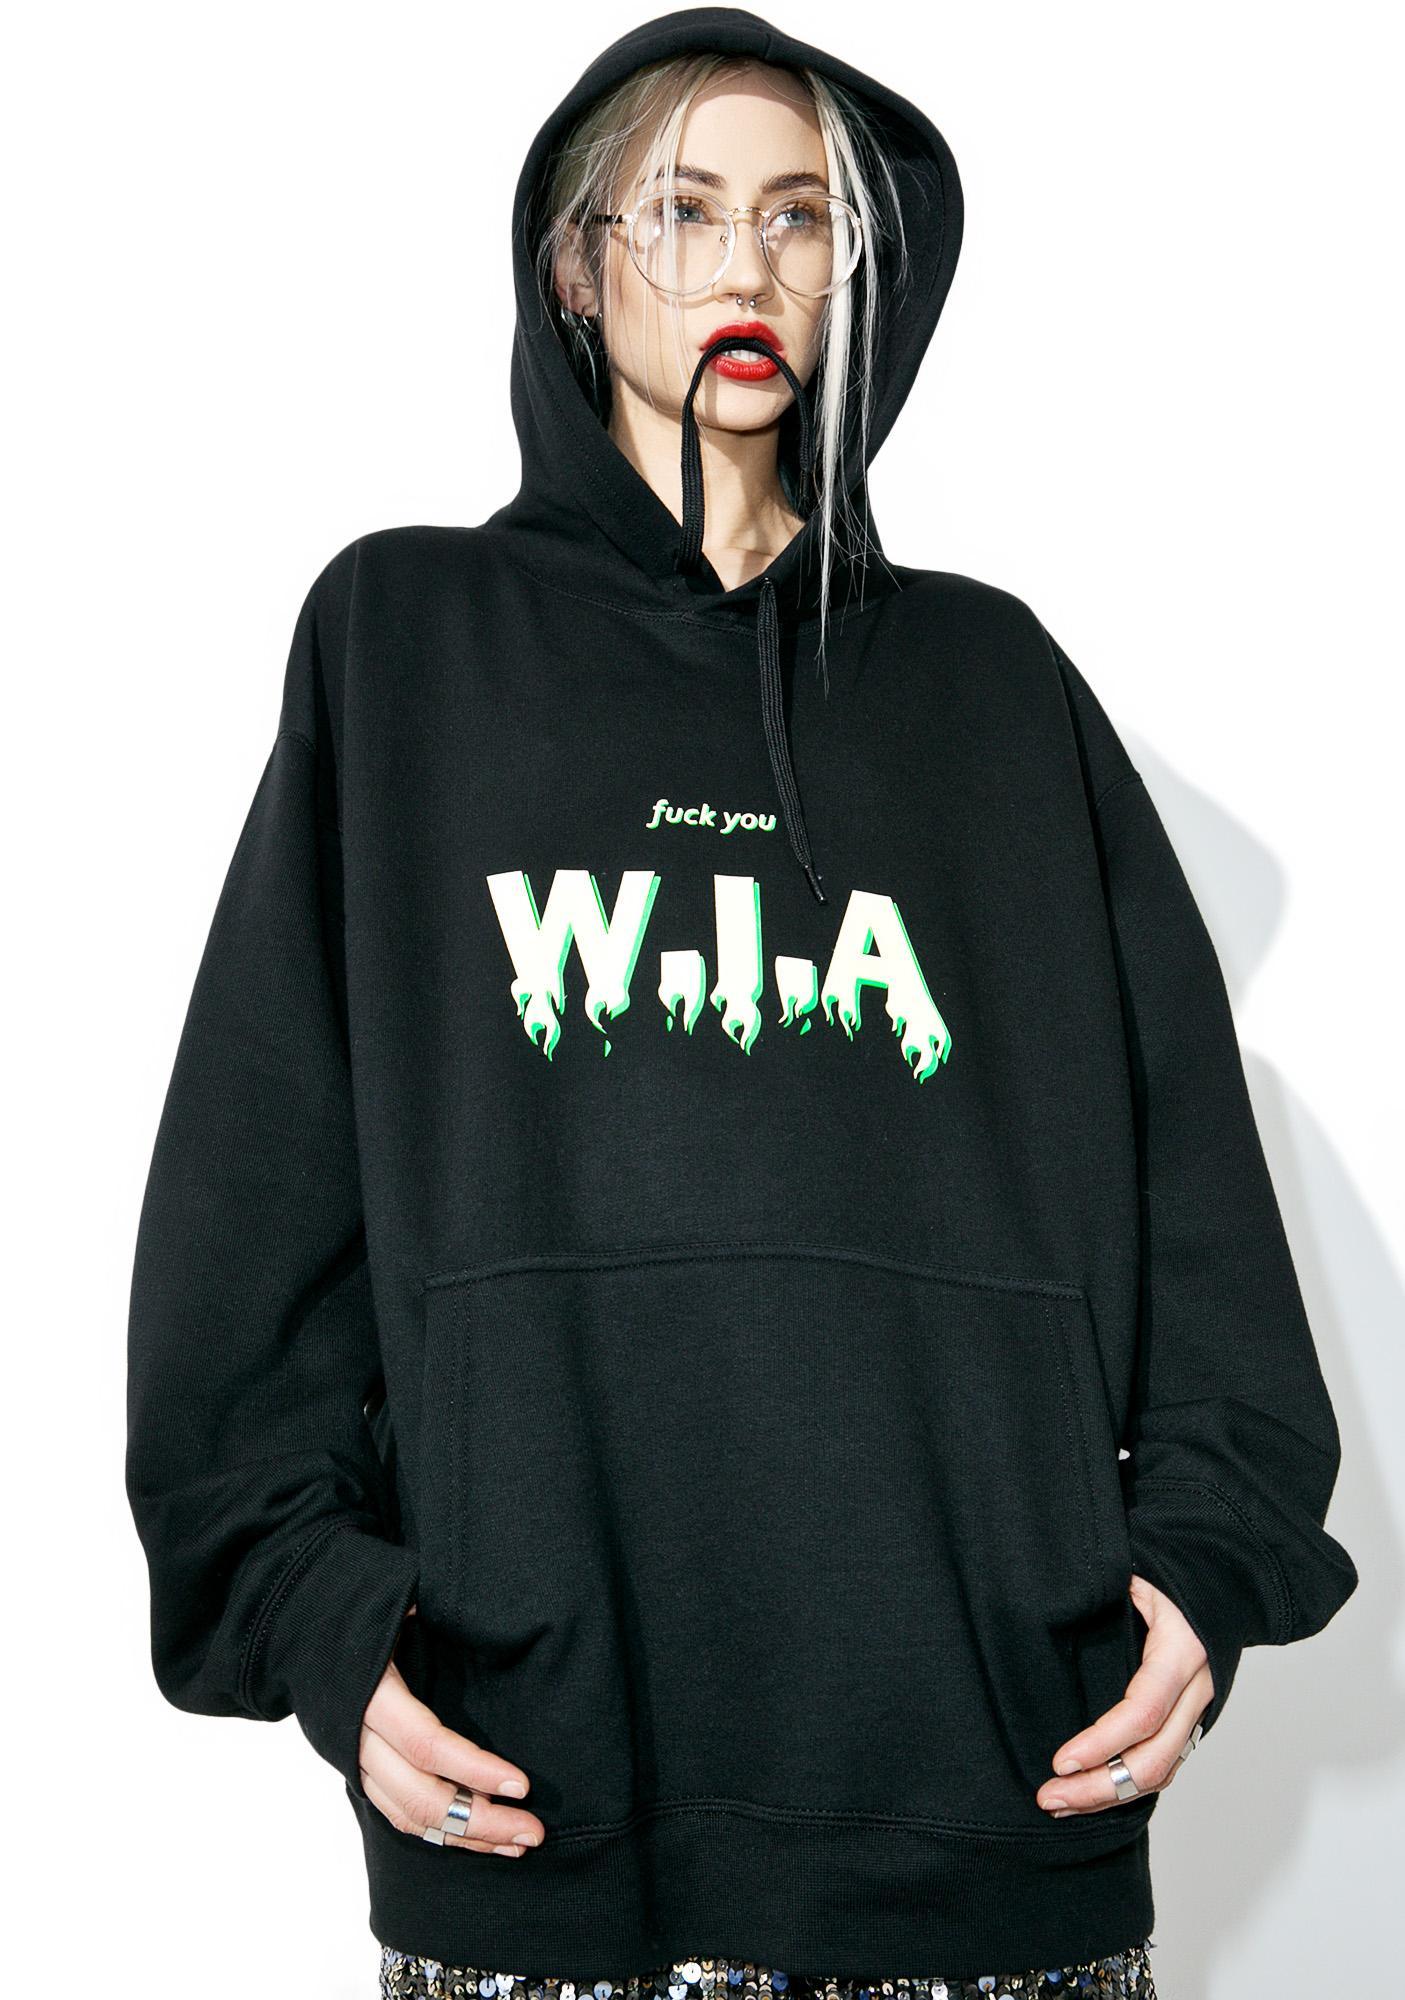 W.I.A On Fire Oversize Hoodie